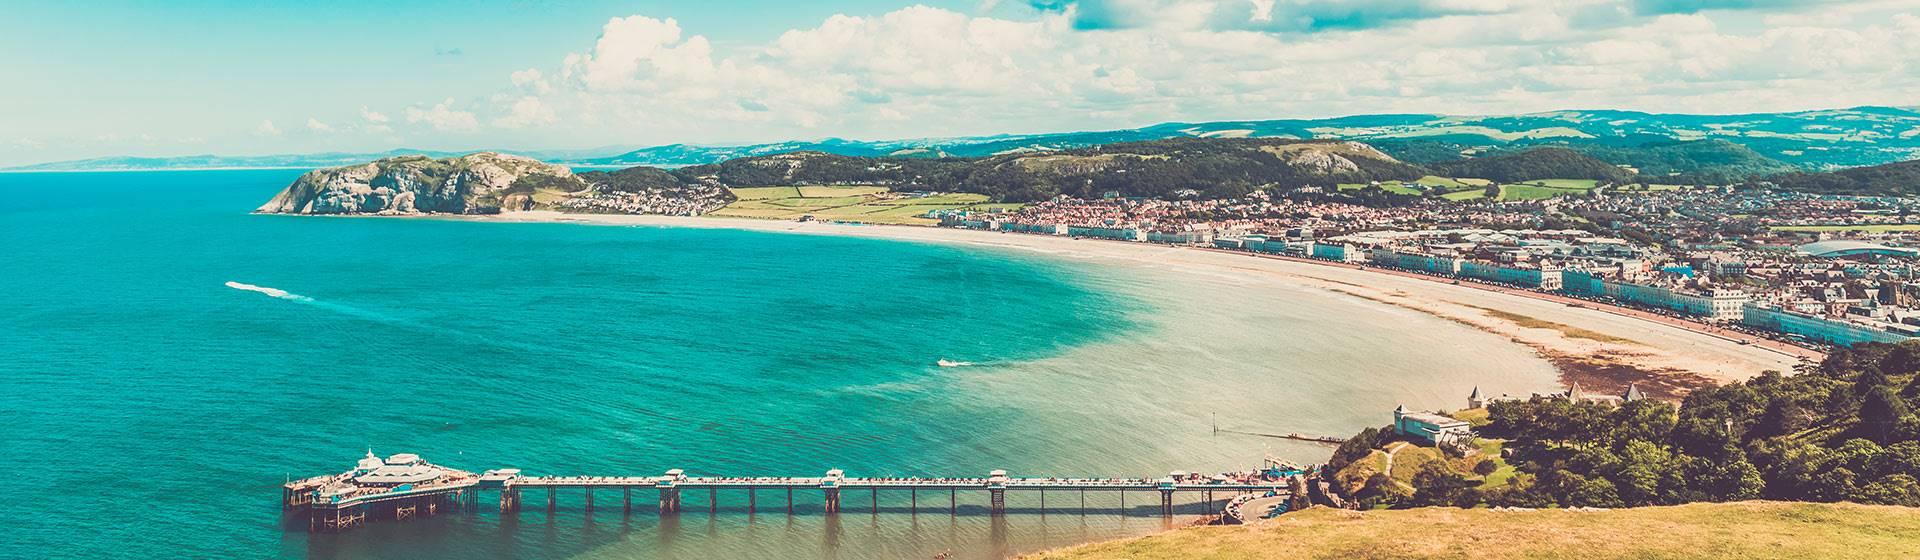 Llandudno Welsh Seaside Day Out